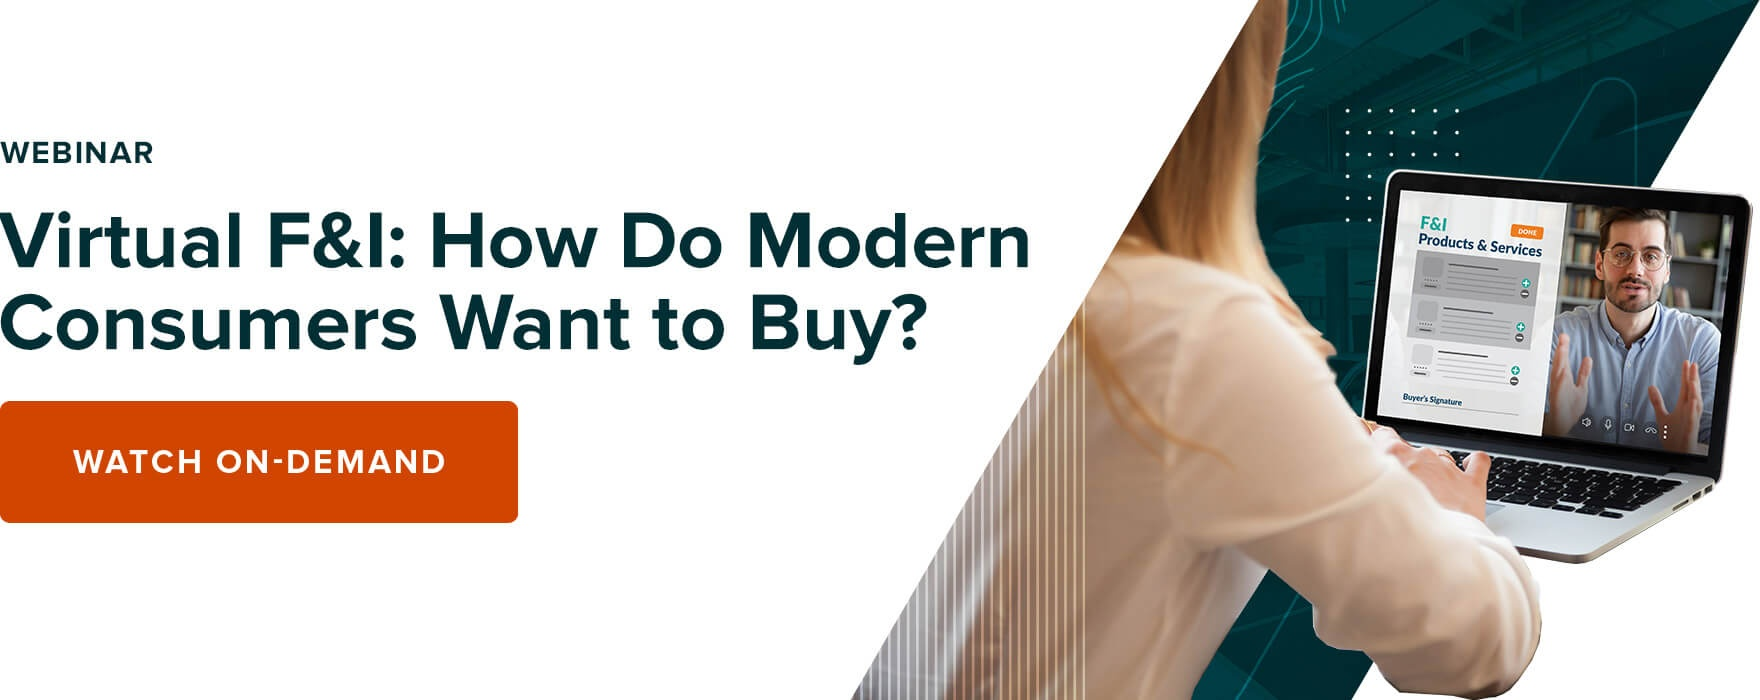 Webinar: Virtual F&I - How Do Modern Consumers Want to Buy?